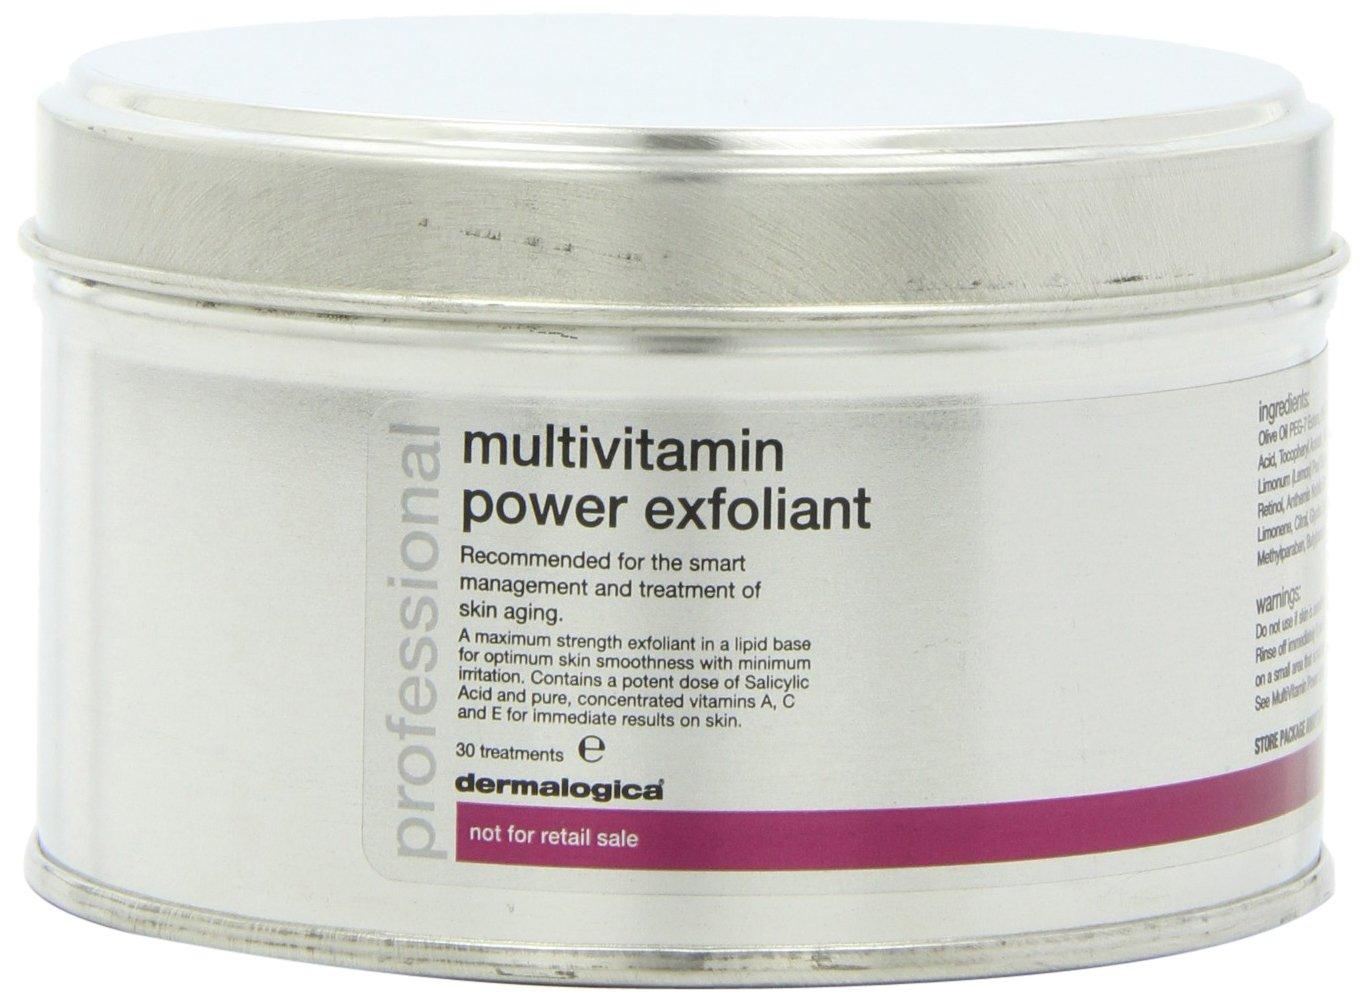 Dermalogica Multivitamin Power Exfoliant Kit 213321